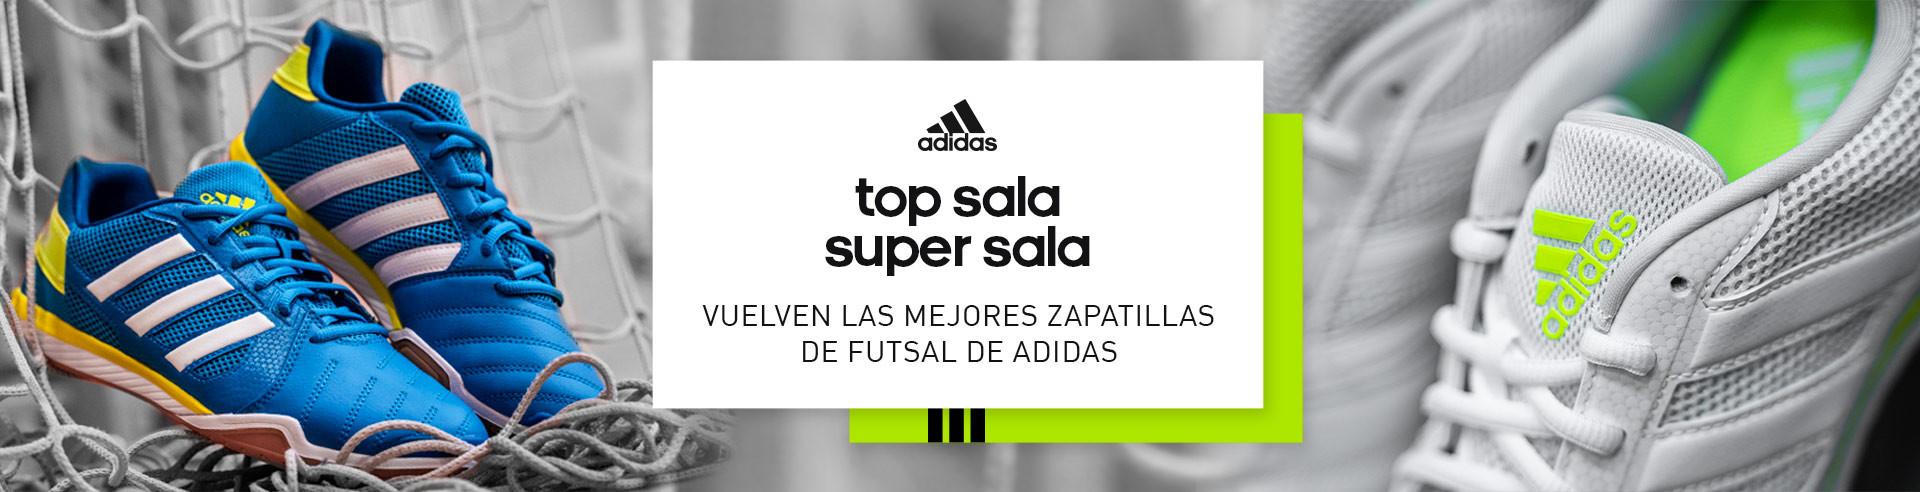 Adidas Top Sala y Super Sala